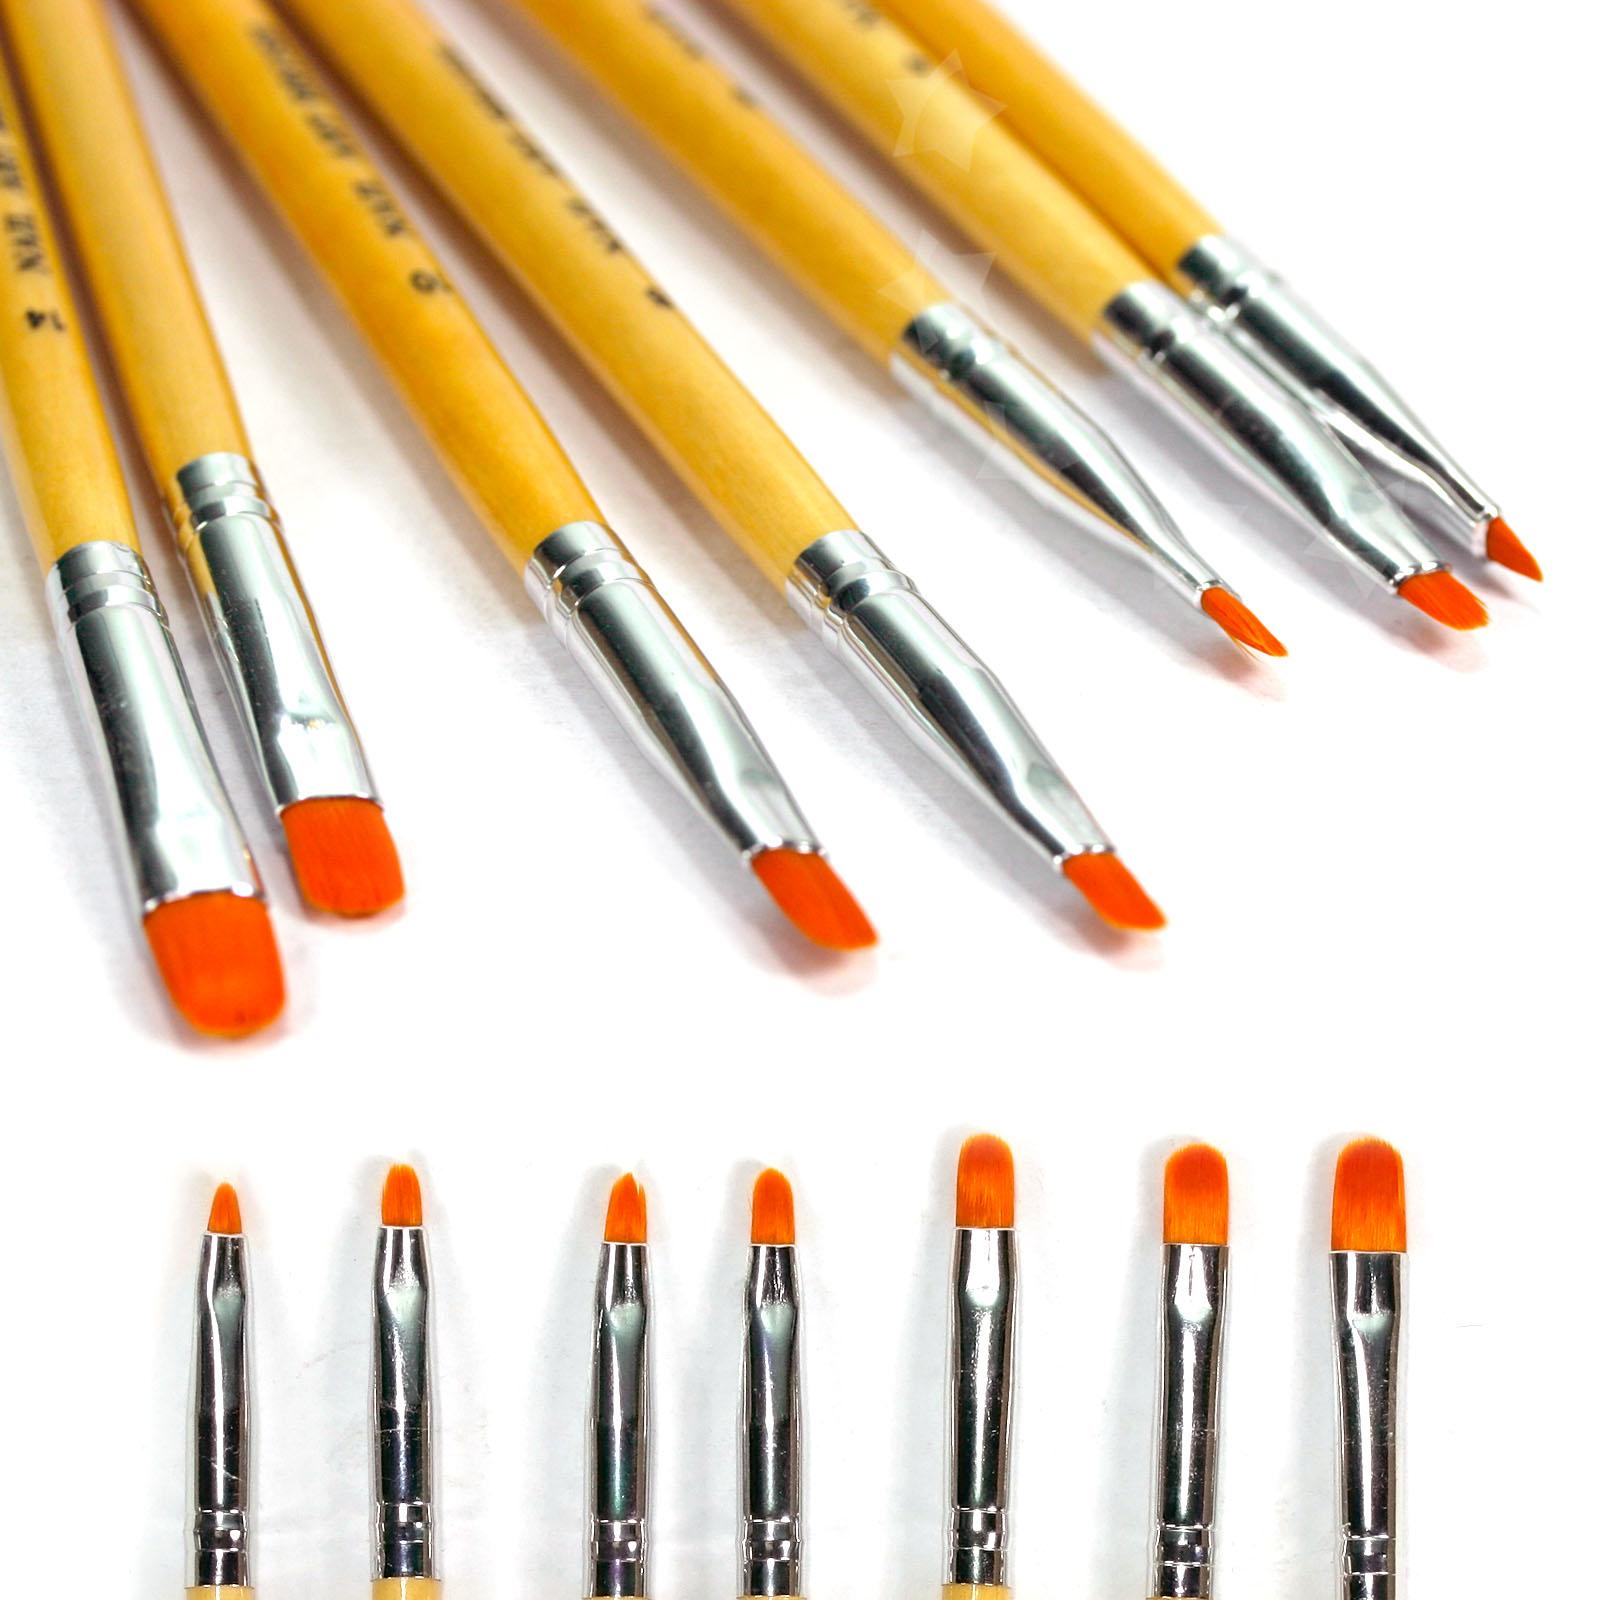 Brush On Nail Gel: 7pcs Nail Art Brush Pen Set UV Gel Polish Painting Design